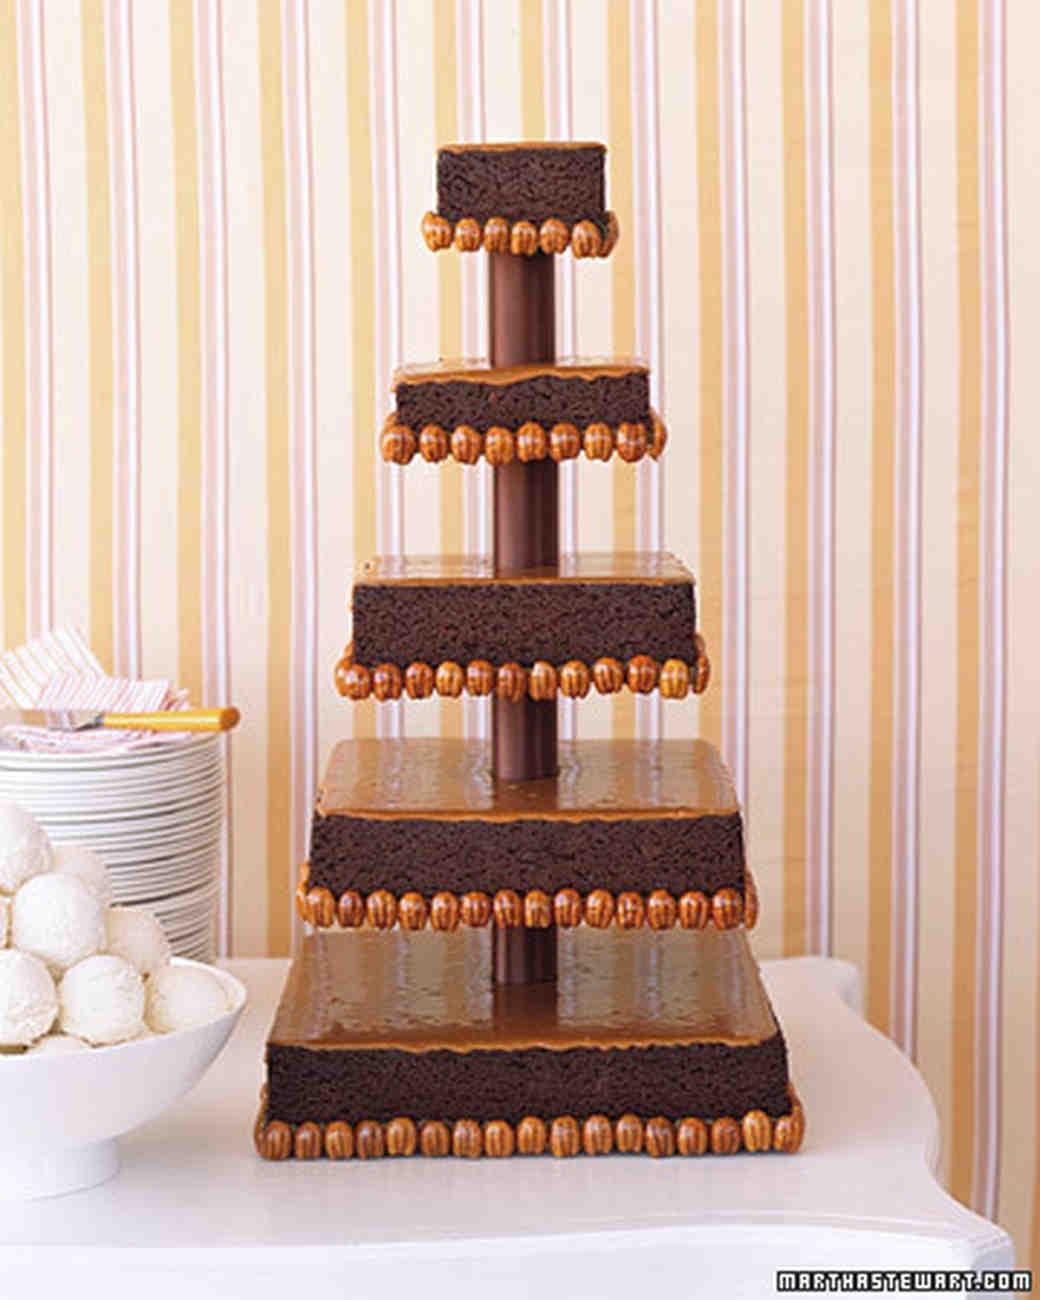 Chocolate Cake Cheesecake Factory Calories Lindas Fudge Cake From